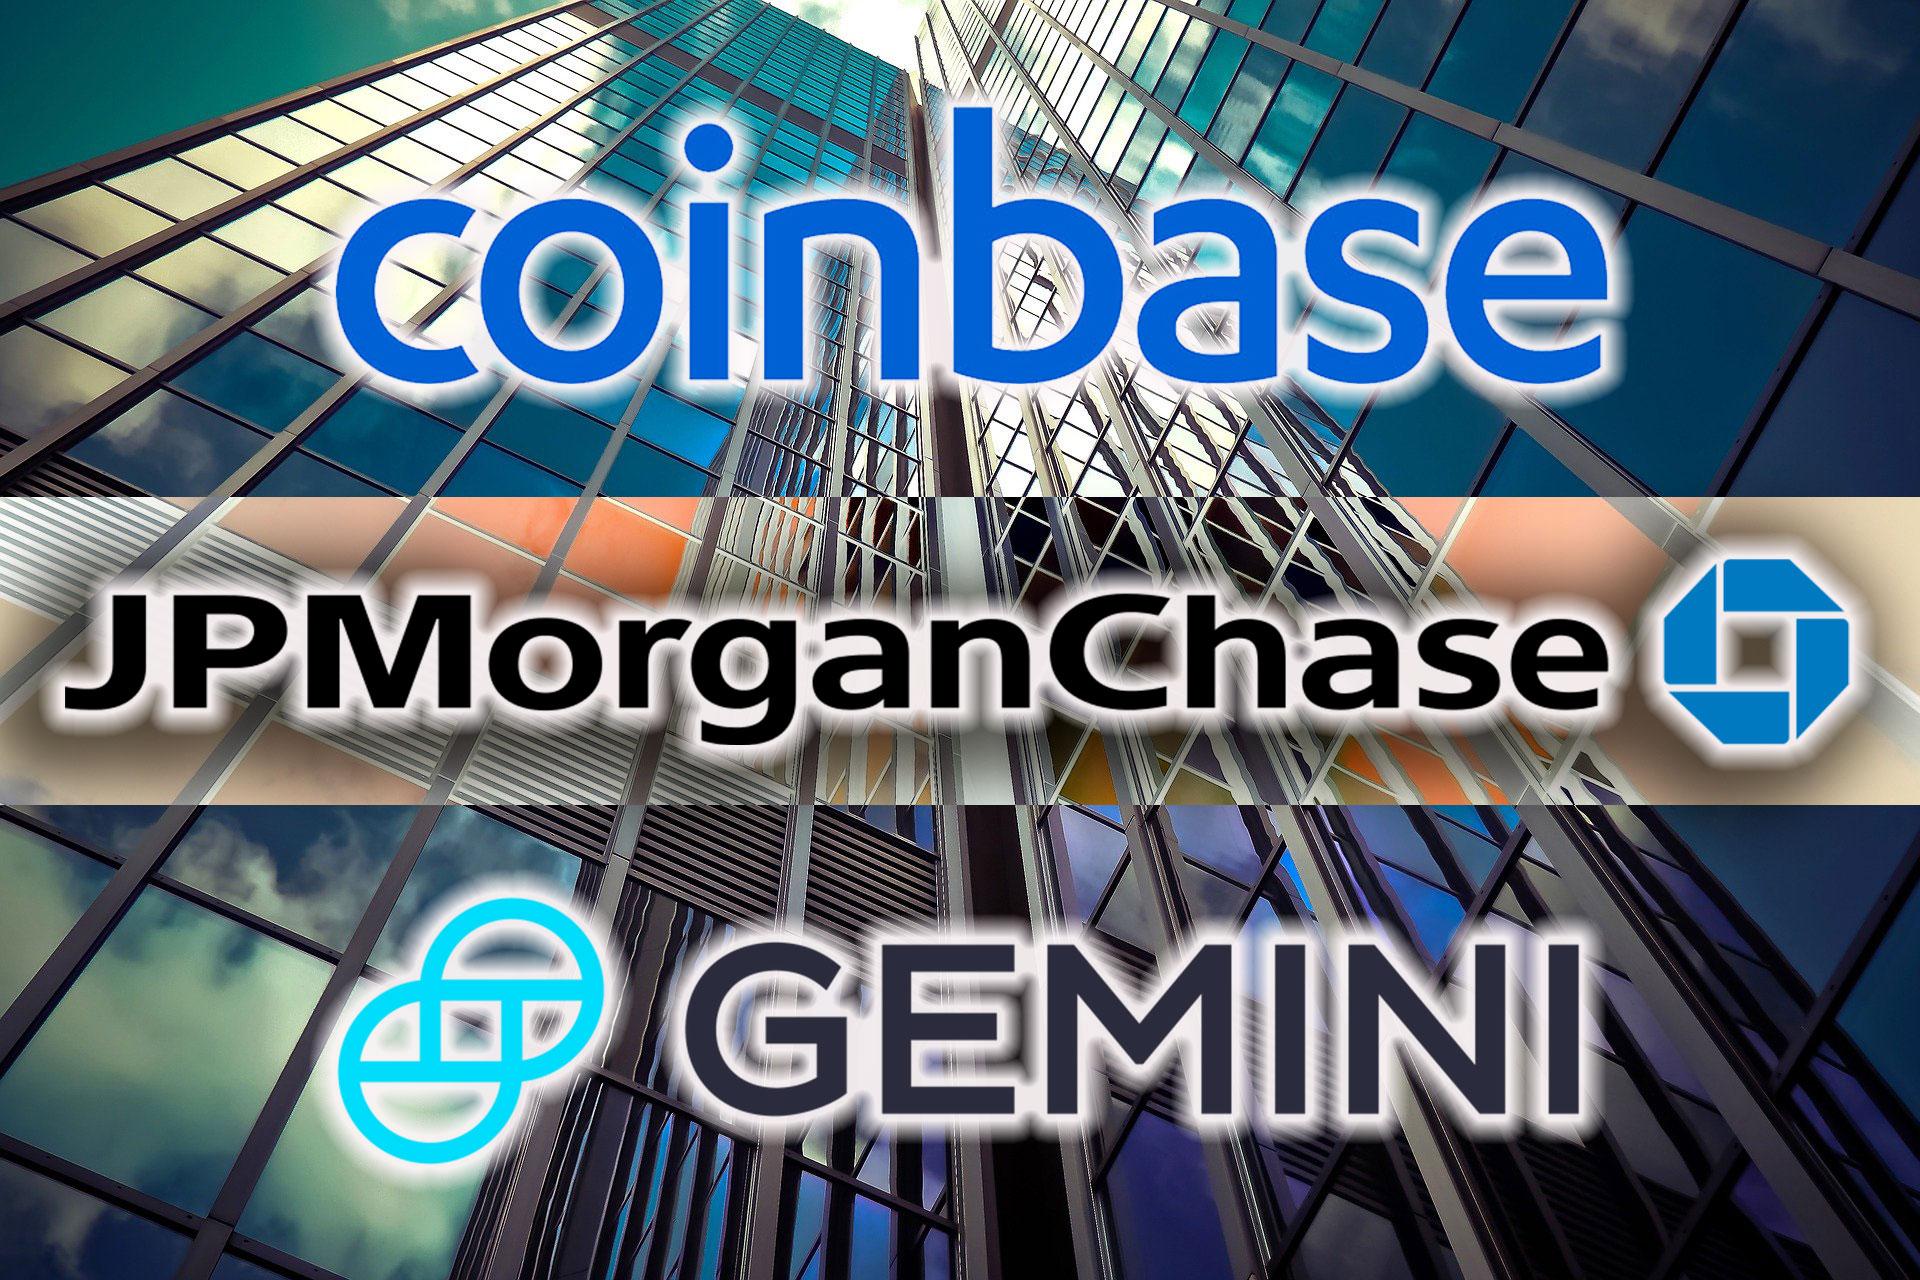 JPモルガンが仮想通貨取引所CoinbaseとGeminiに銀行サービスを提供か